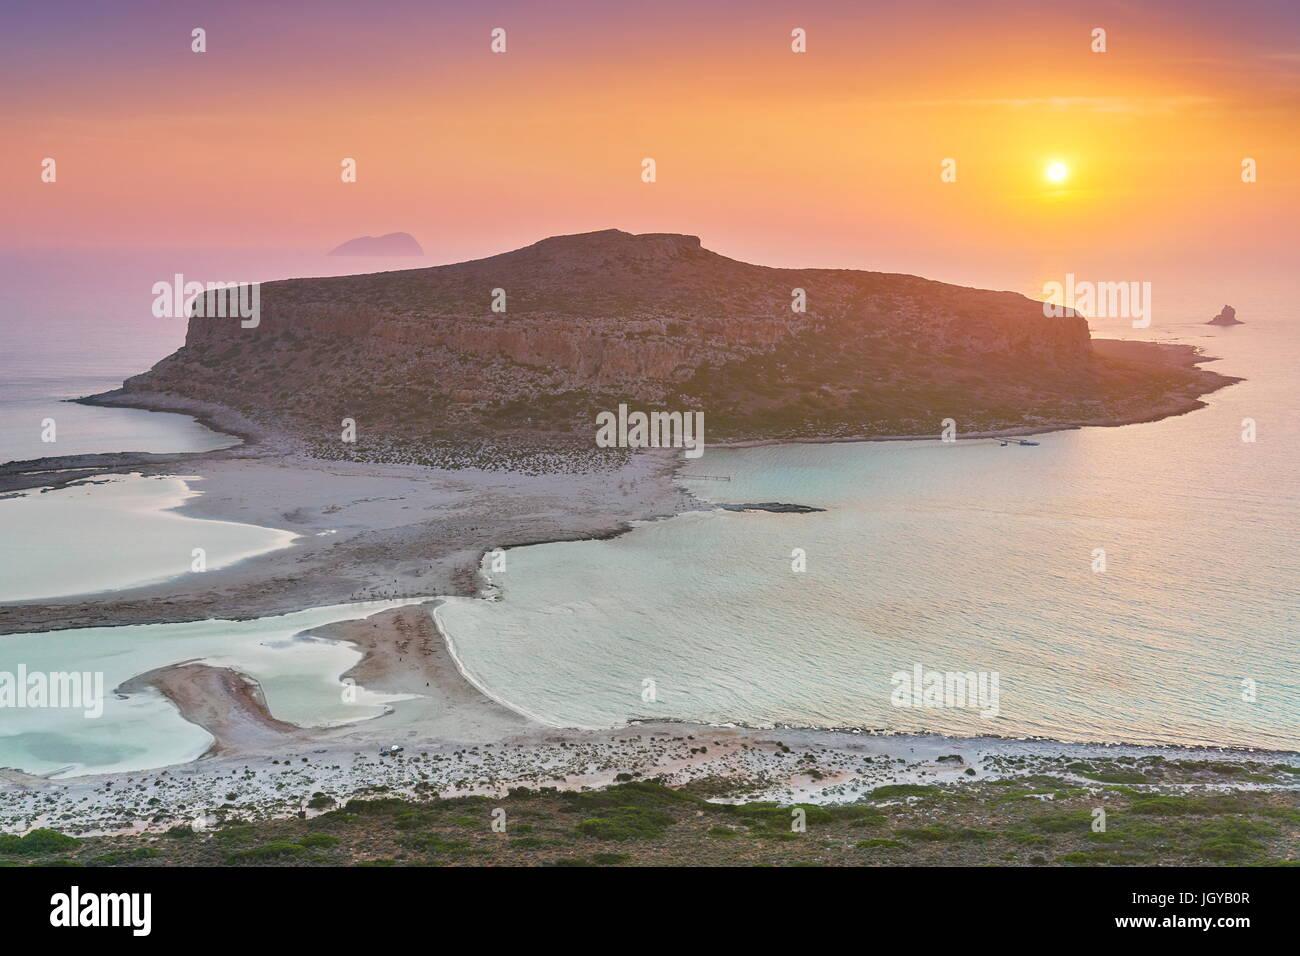 Sunset at Balos Beach, Crete Island, Greece - Stock Image